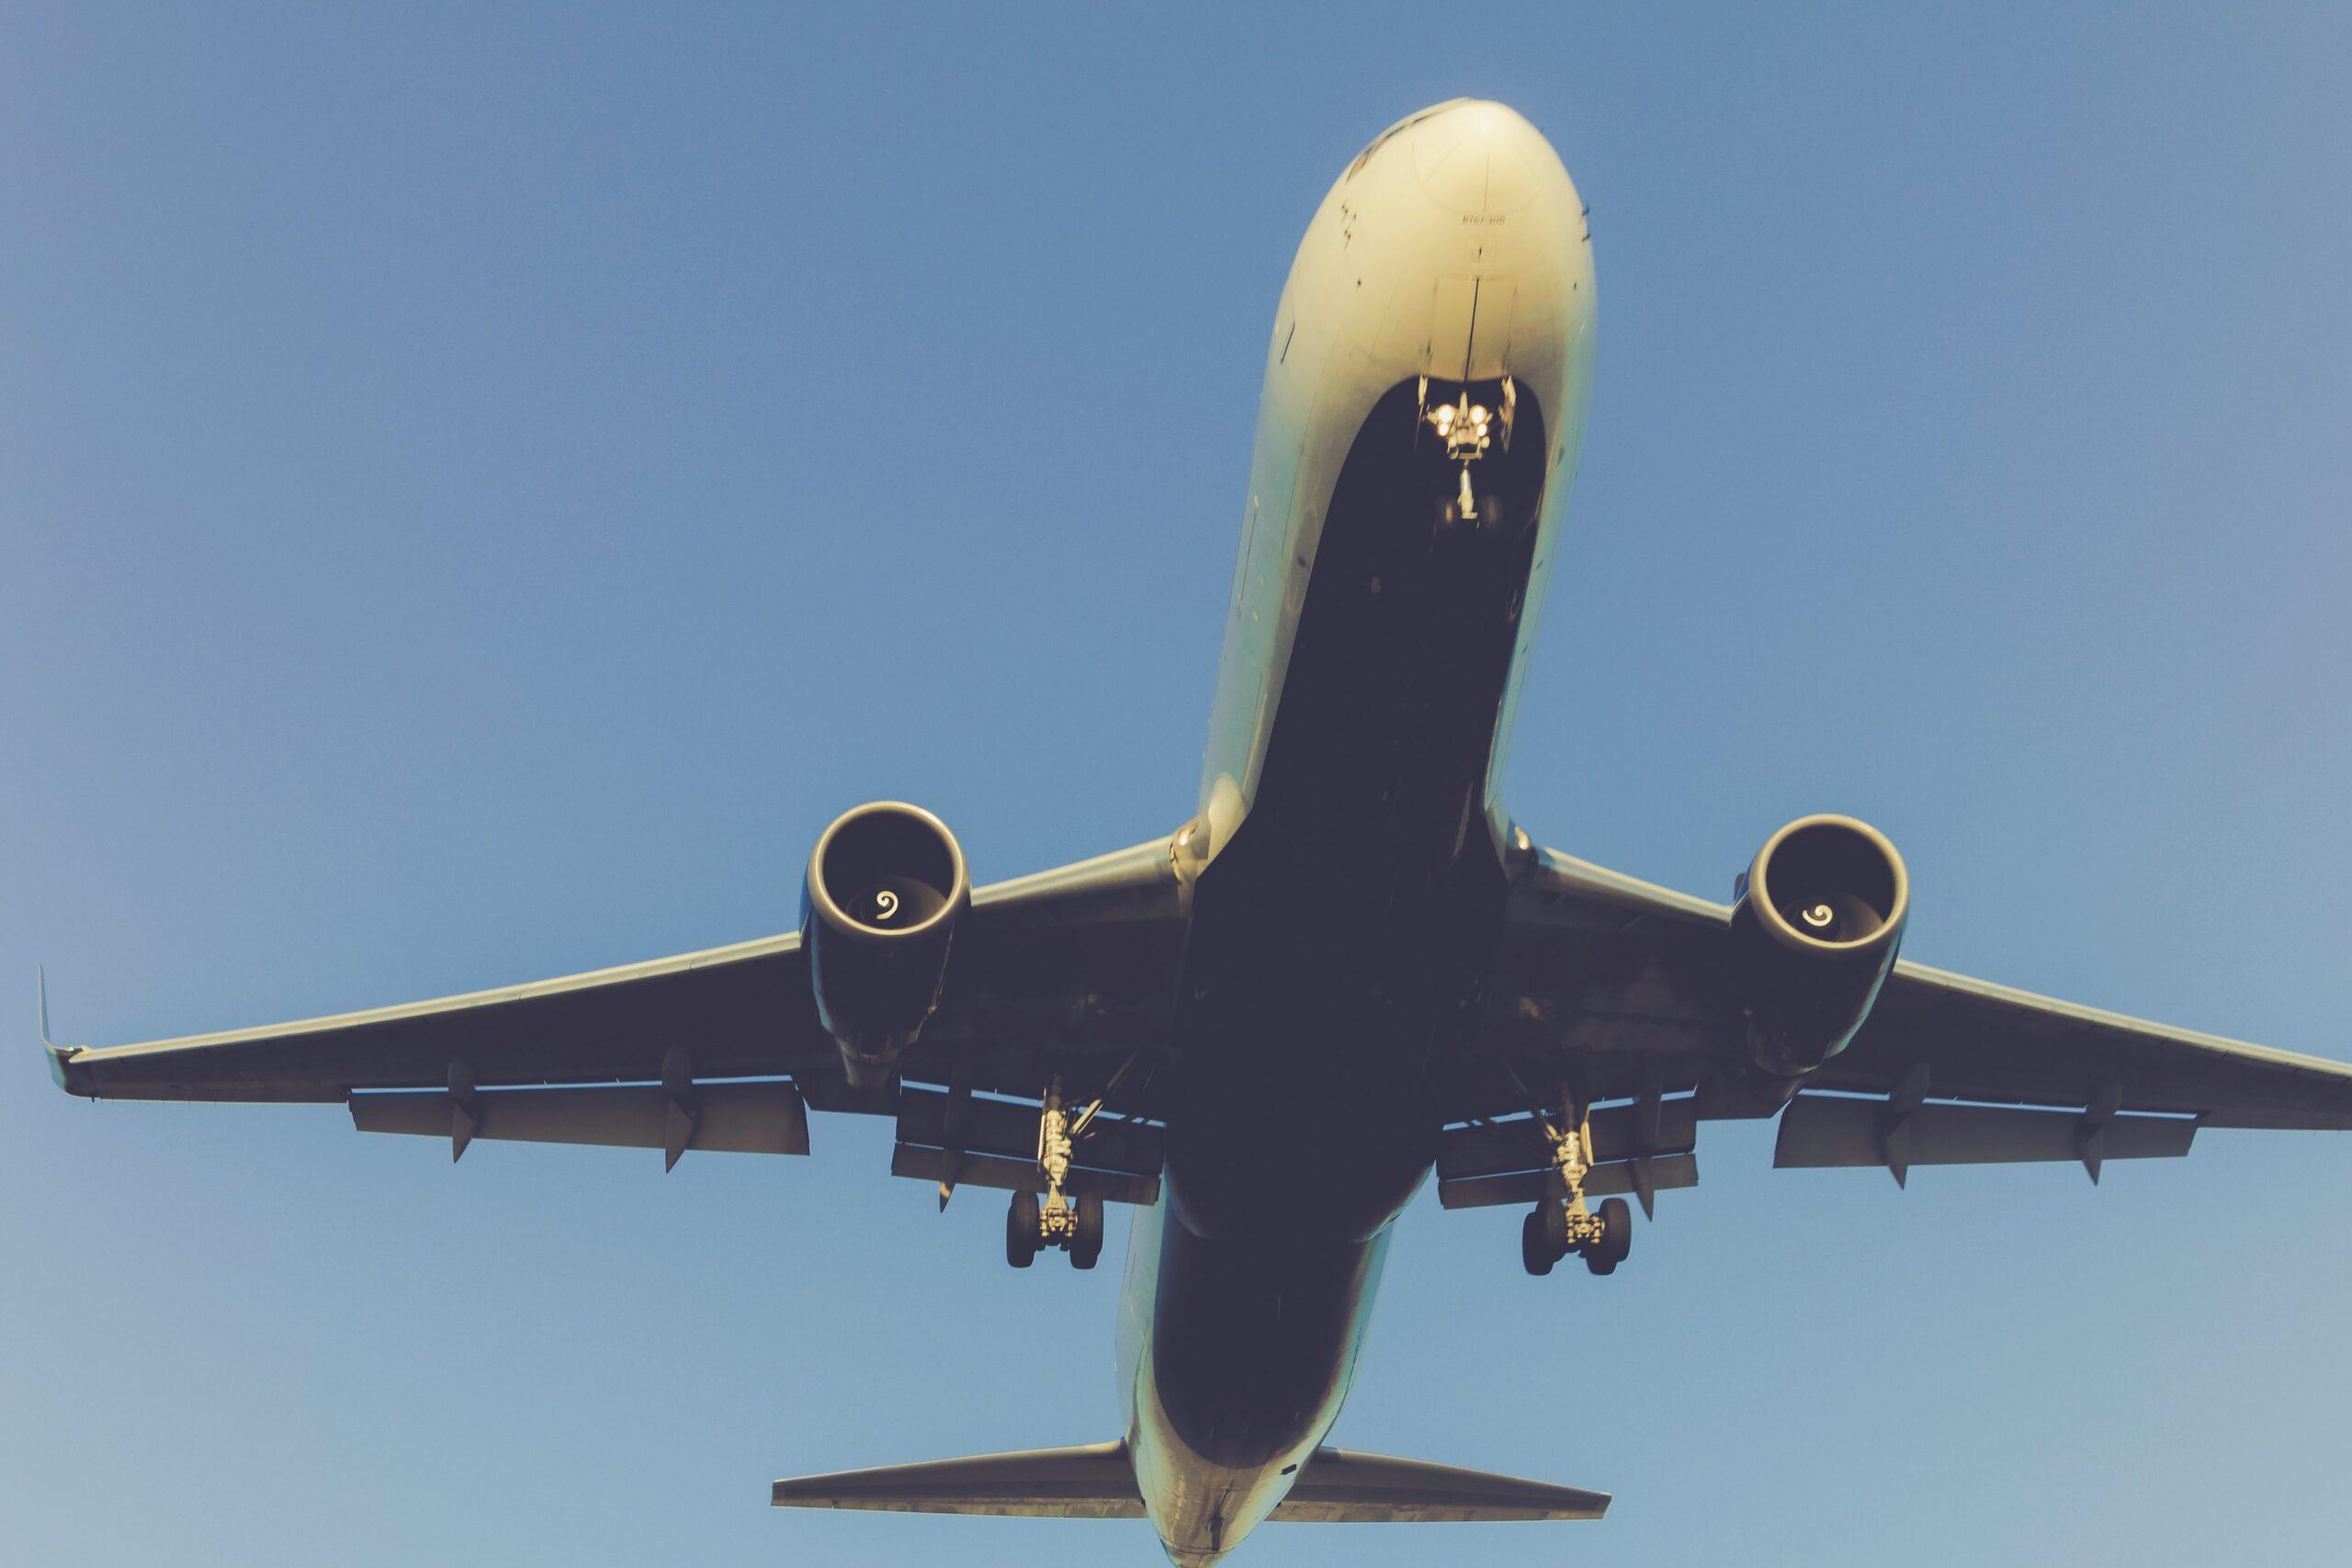 import-China-produse-avion-marfa